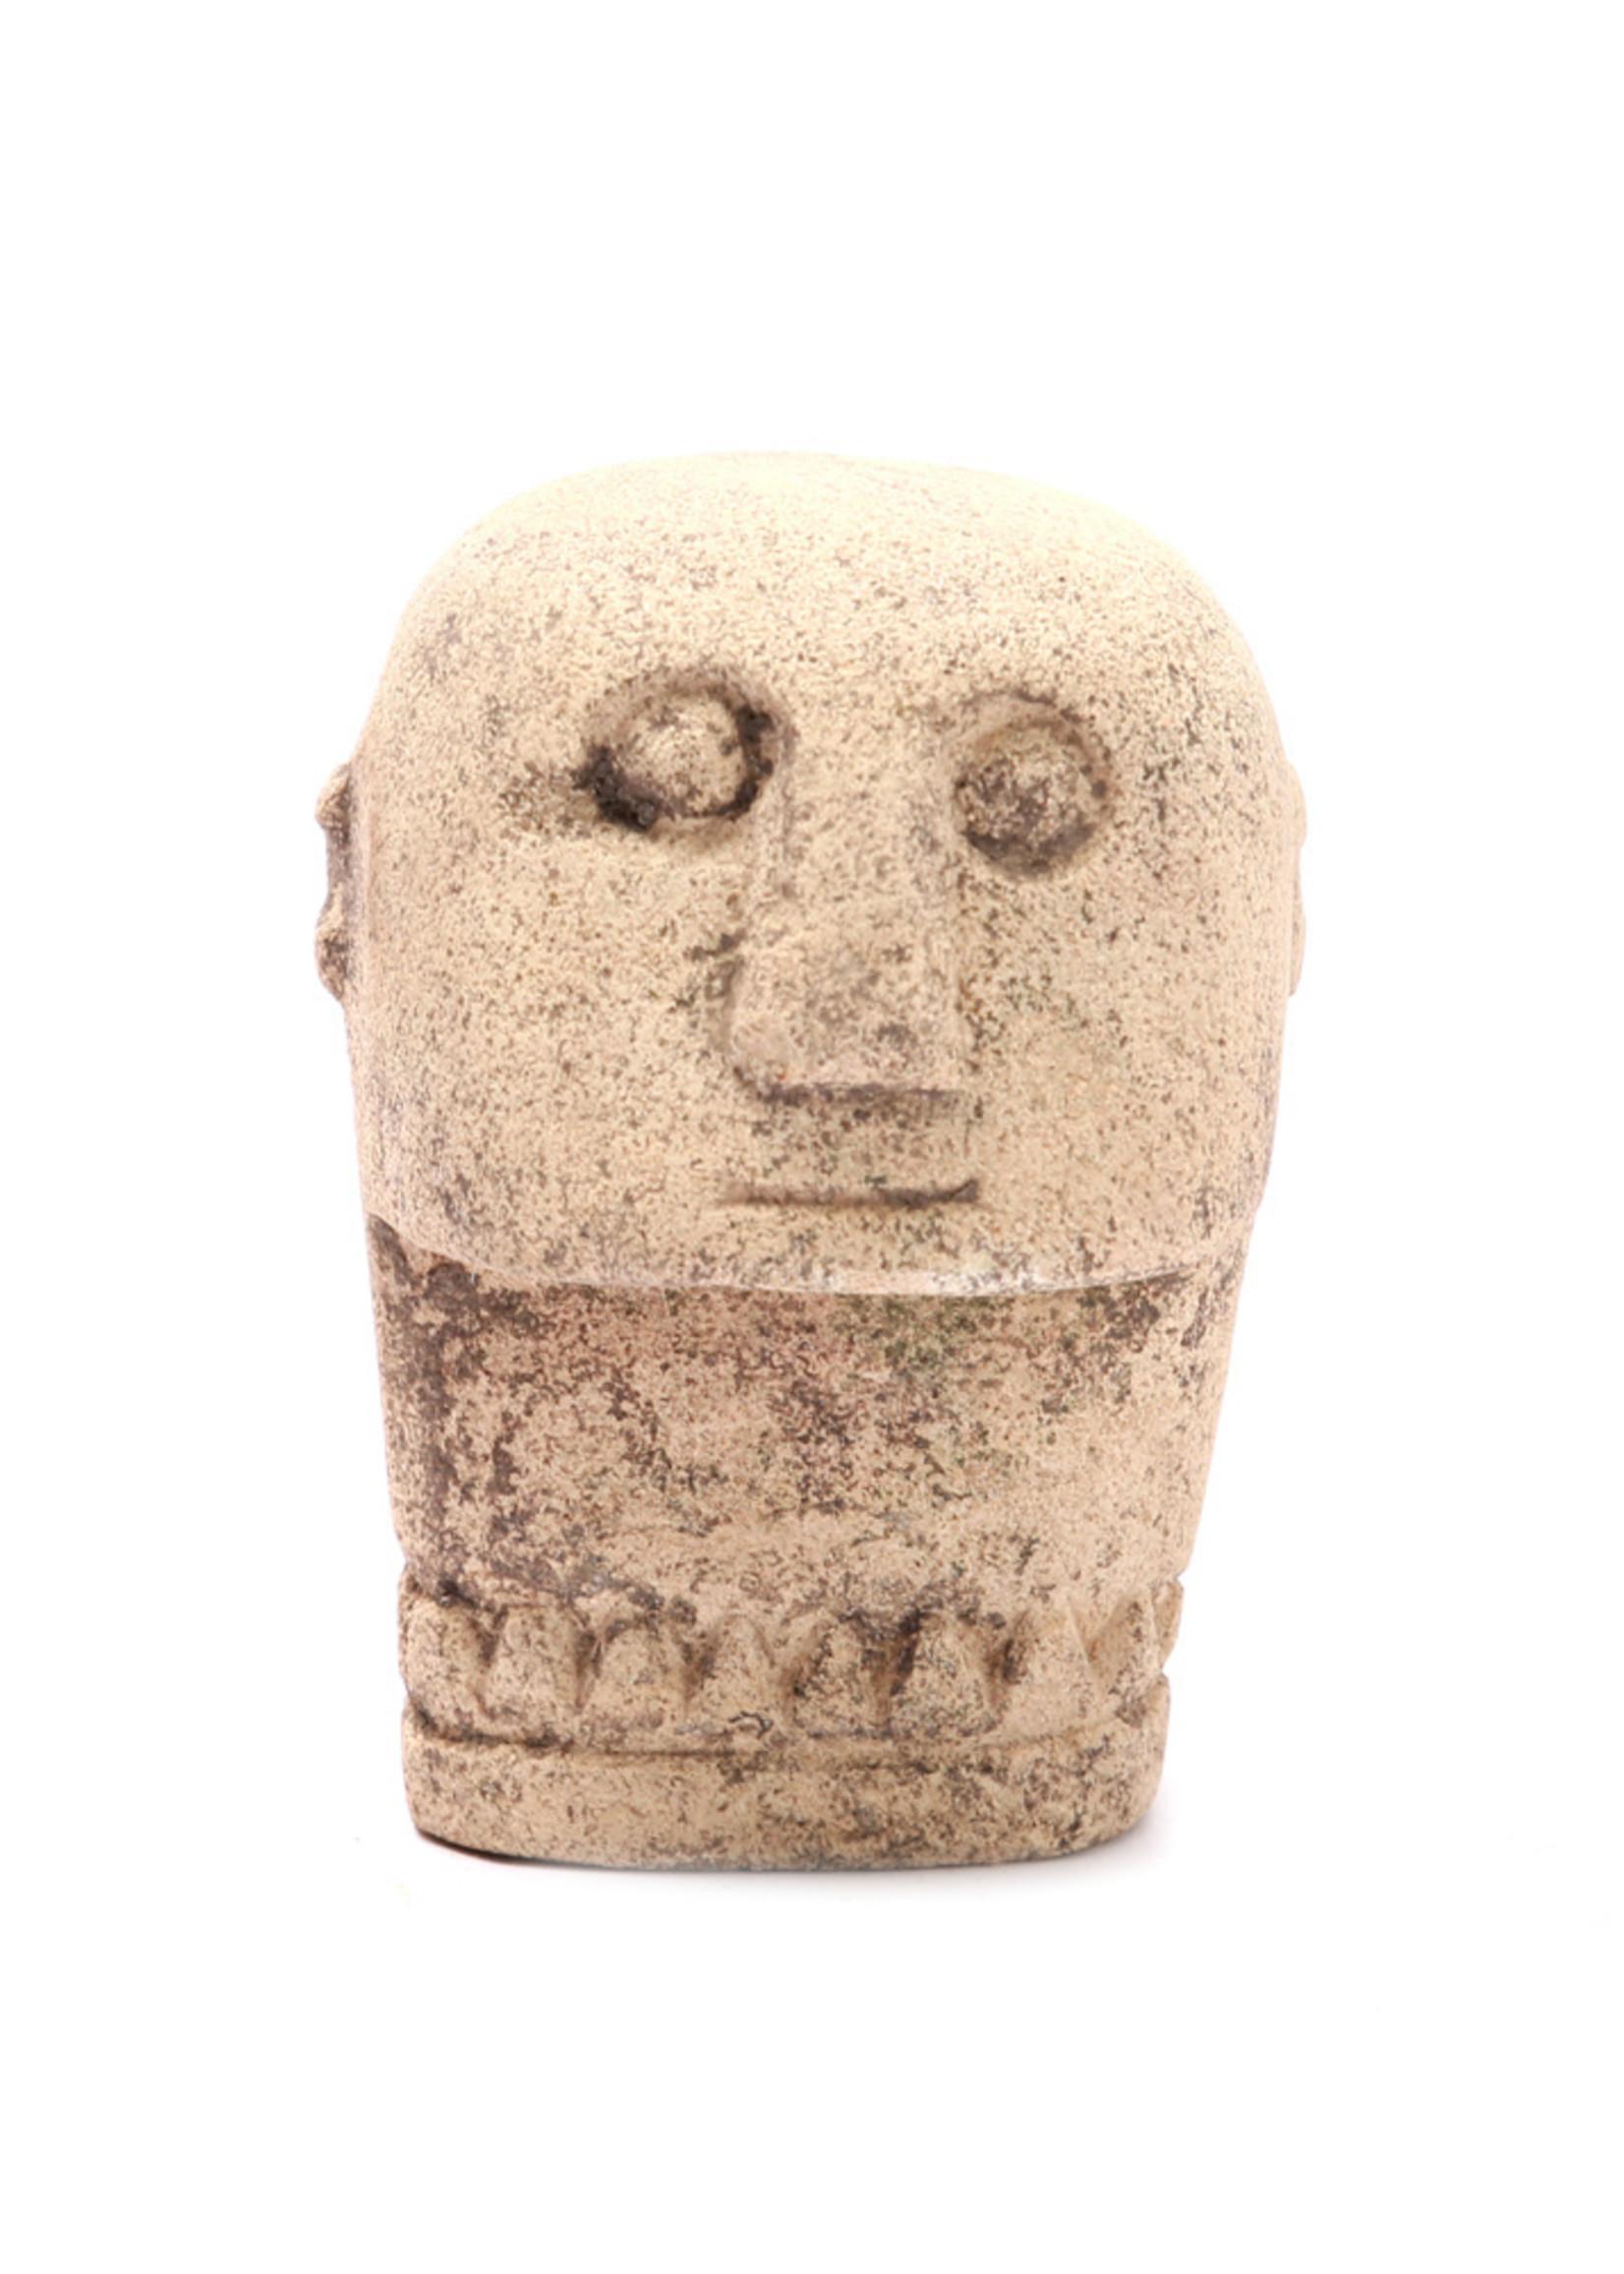 Sumba Stone Statue #09 - Natural